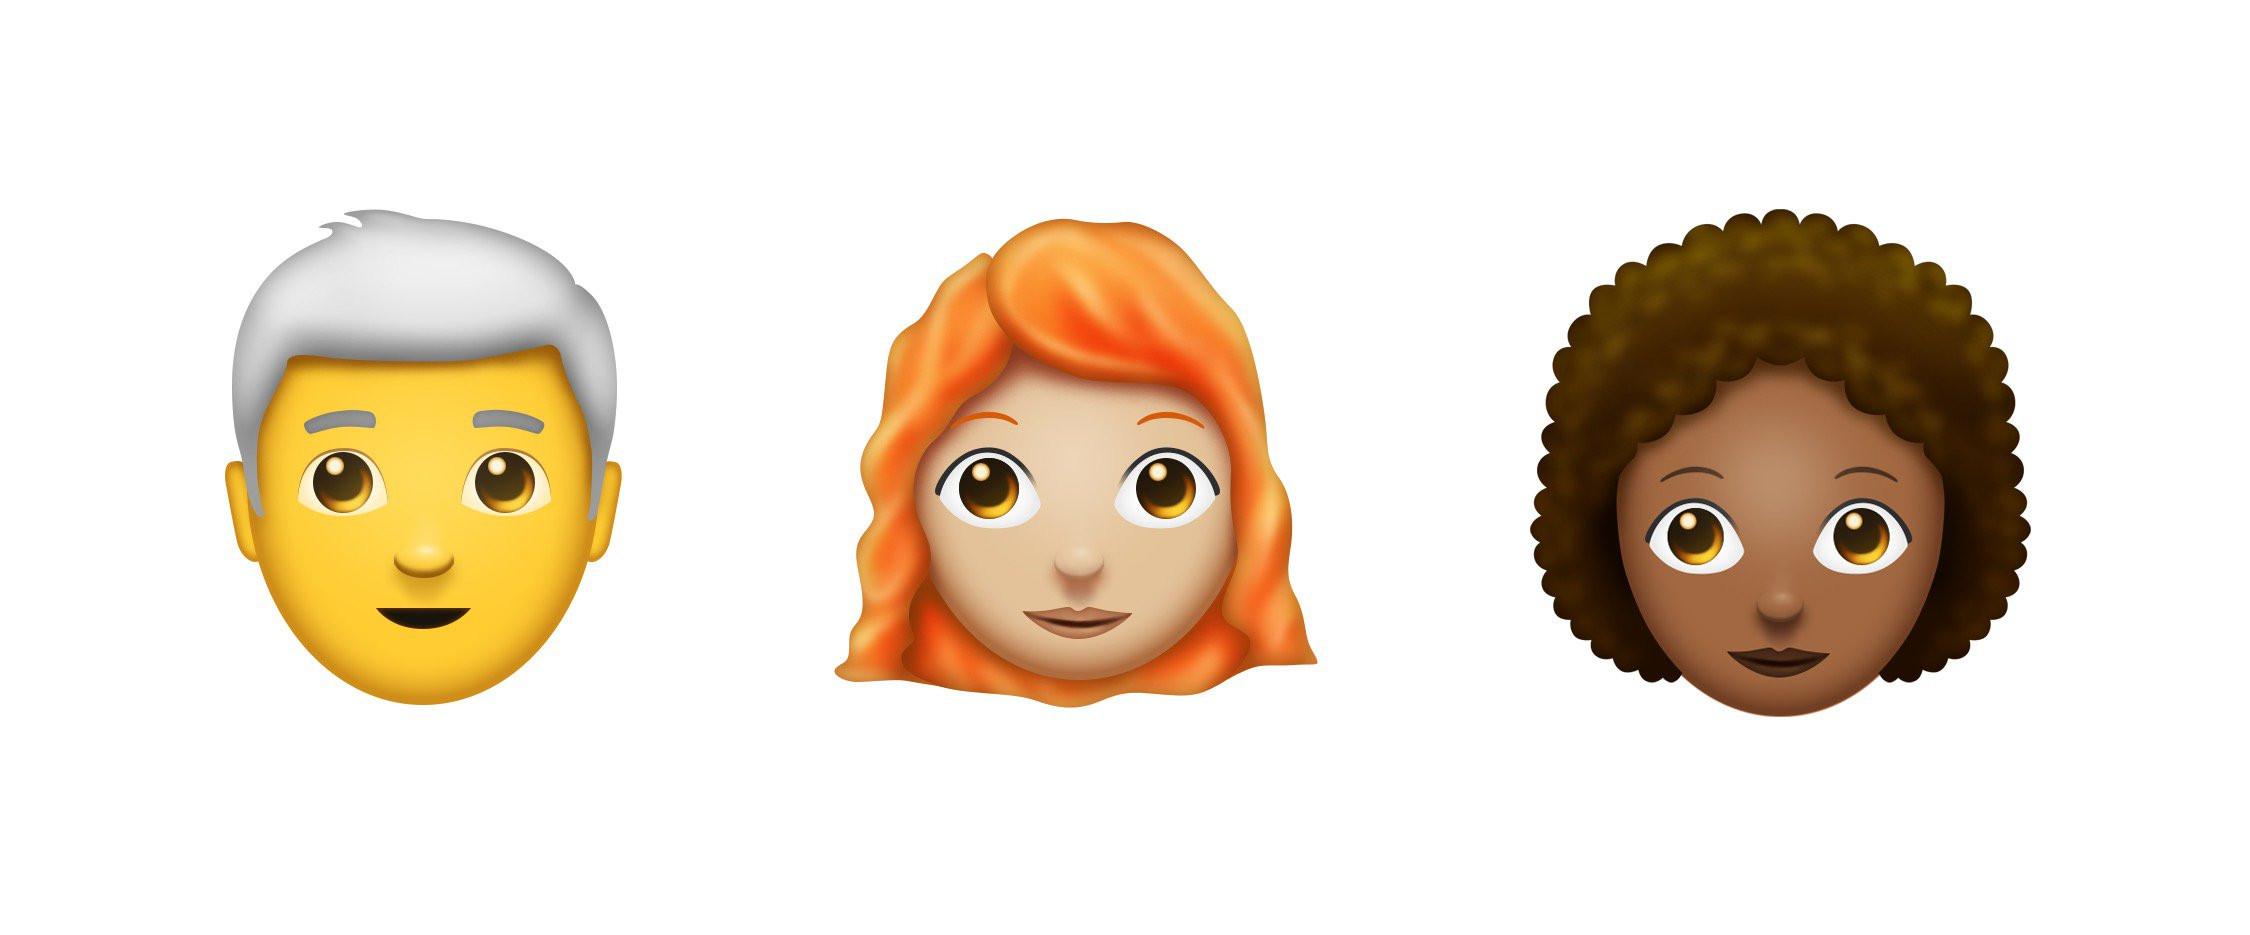 1502104130_redheads-more-emojipedia.jpg